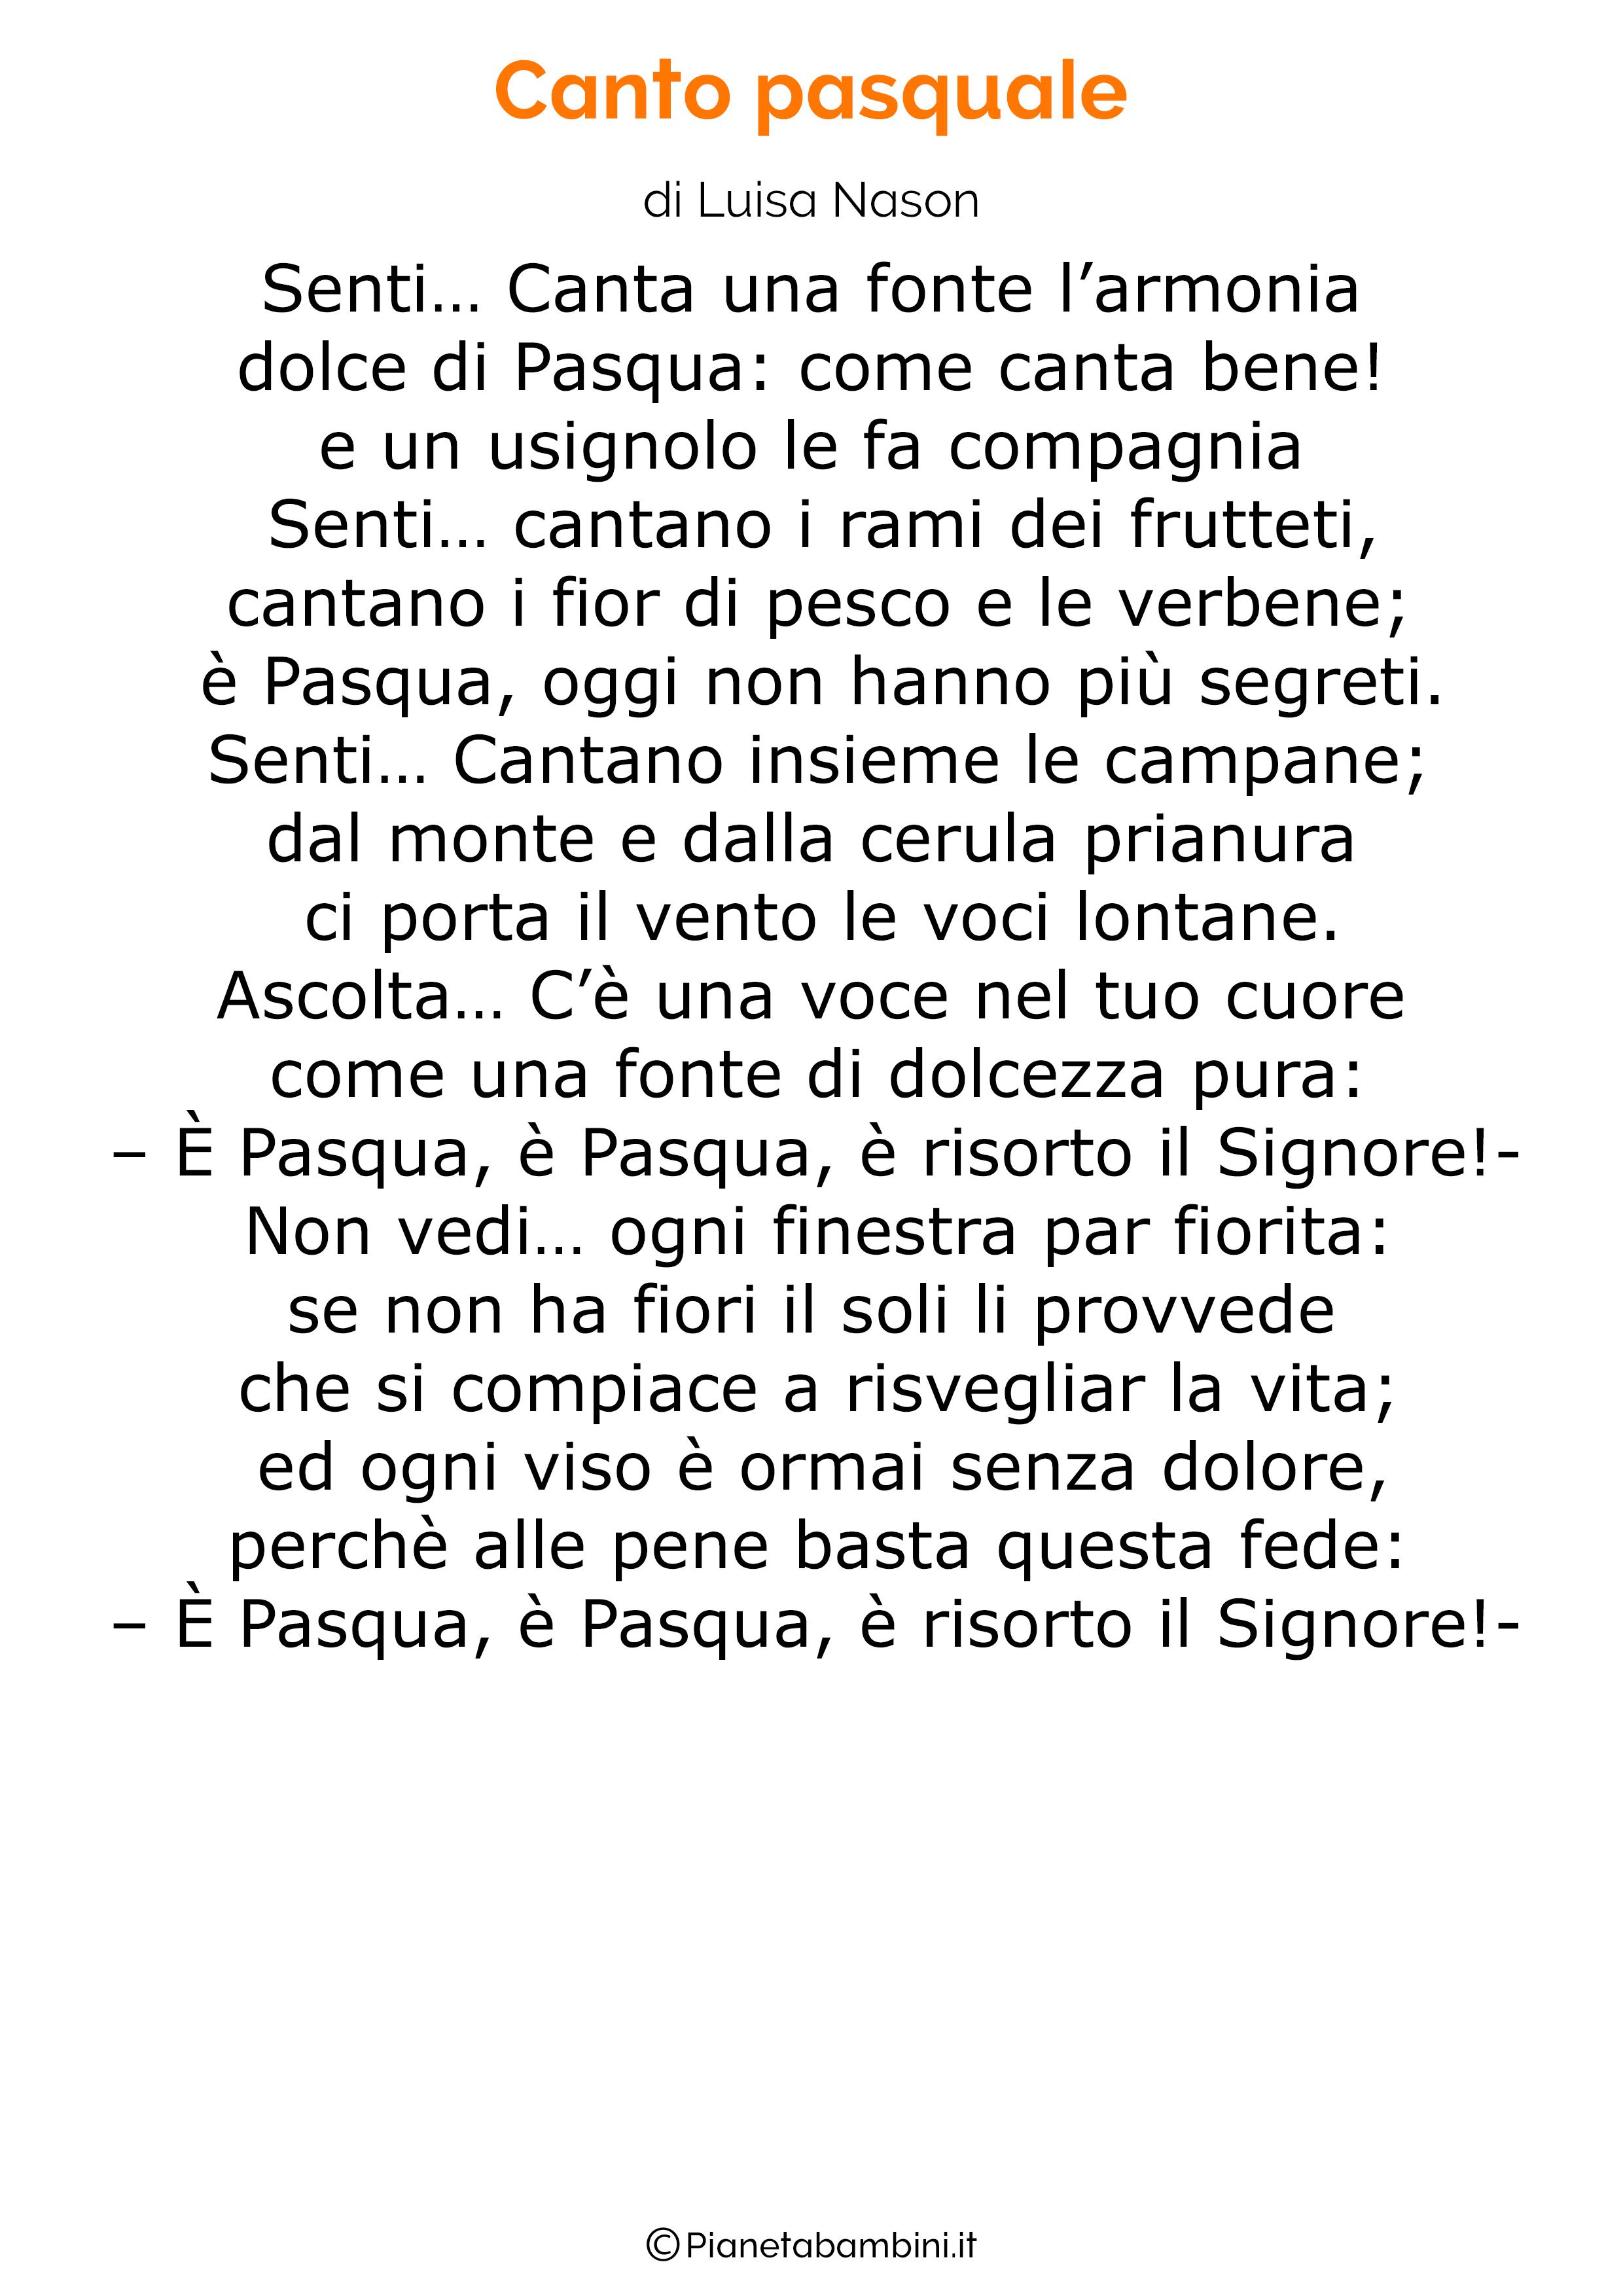 Poesia di Pasqua 06